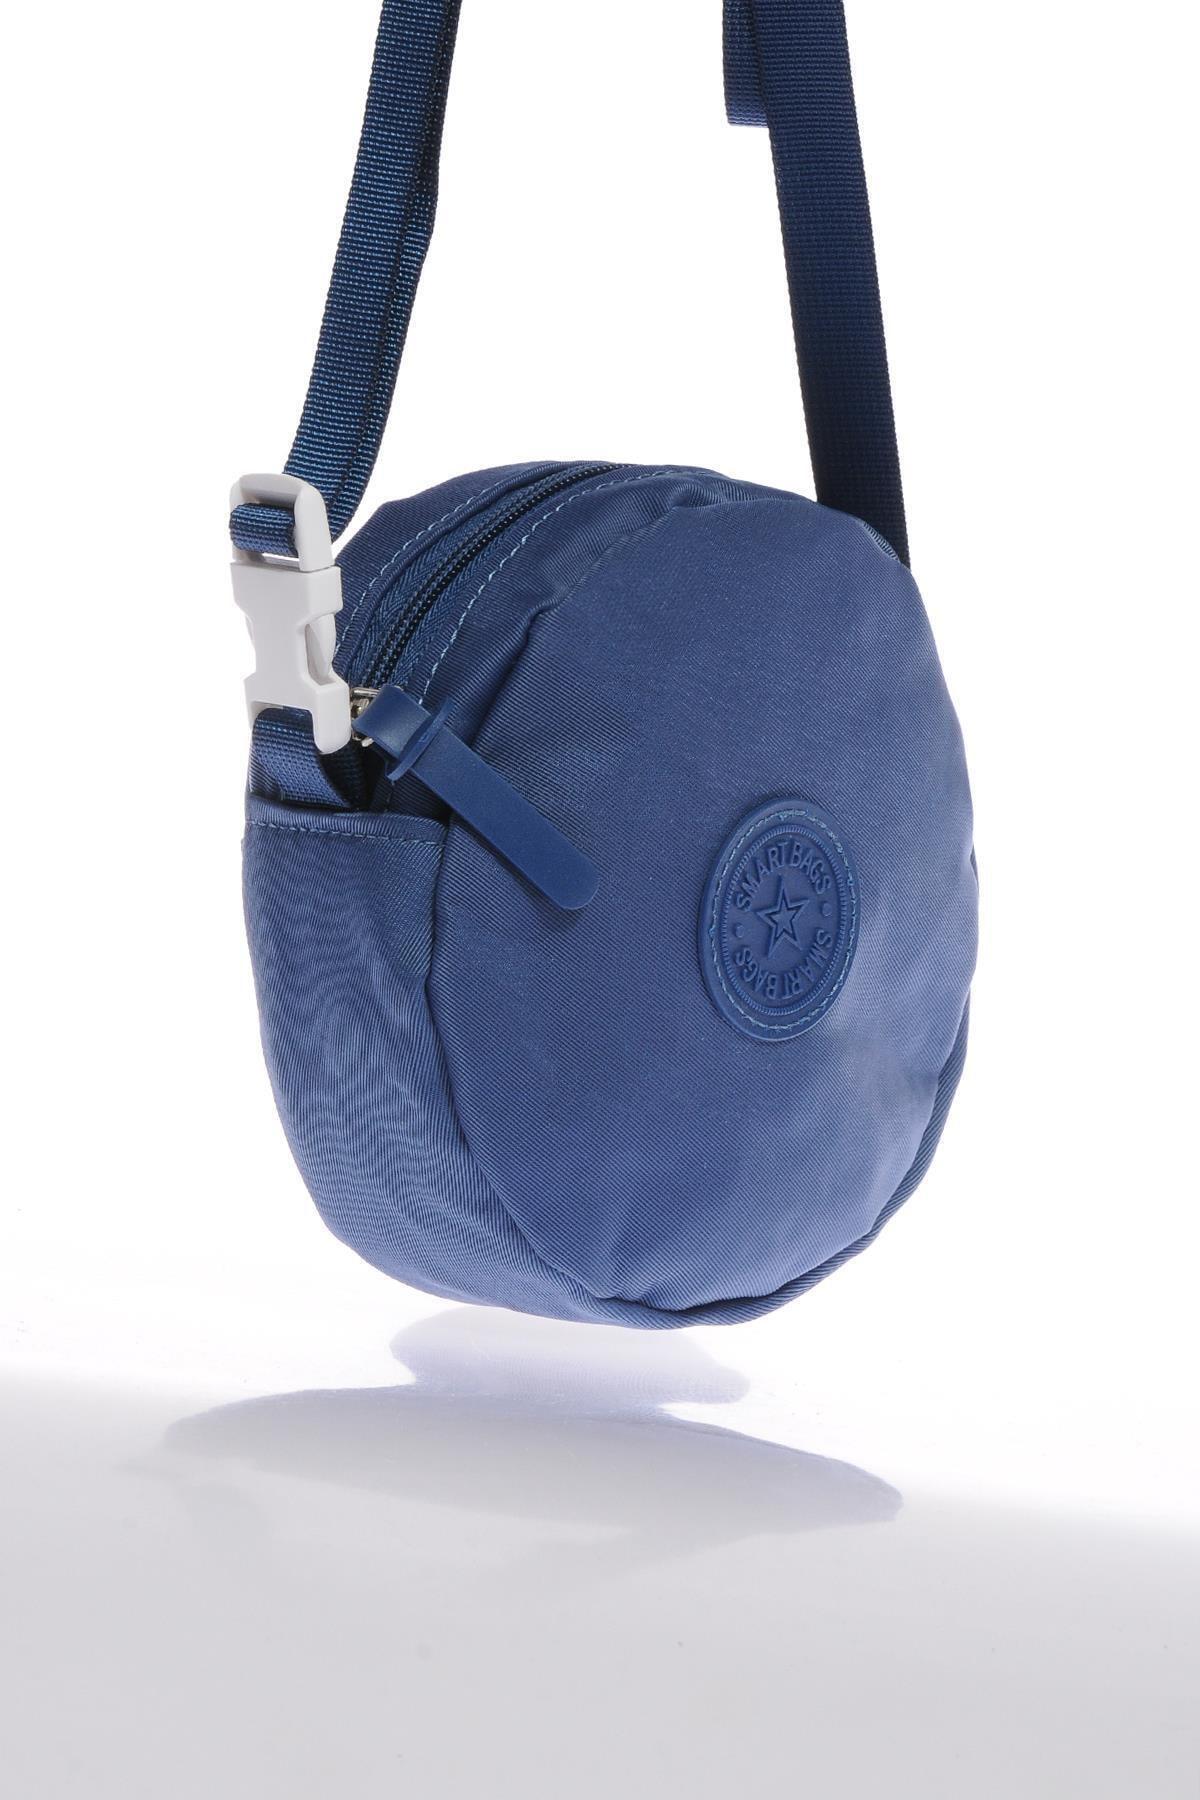 SMART BAGS Smb6001-0050 Buz Mavisi Kadın Minik Çapraz Çanta 2